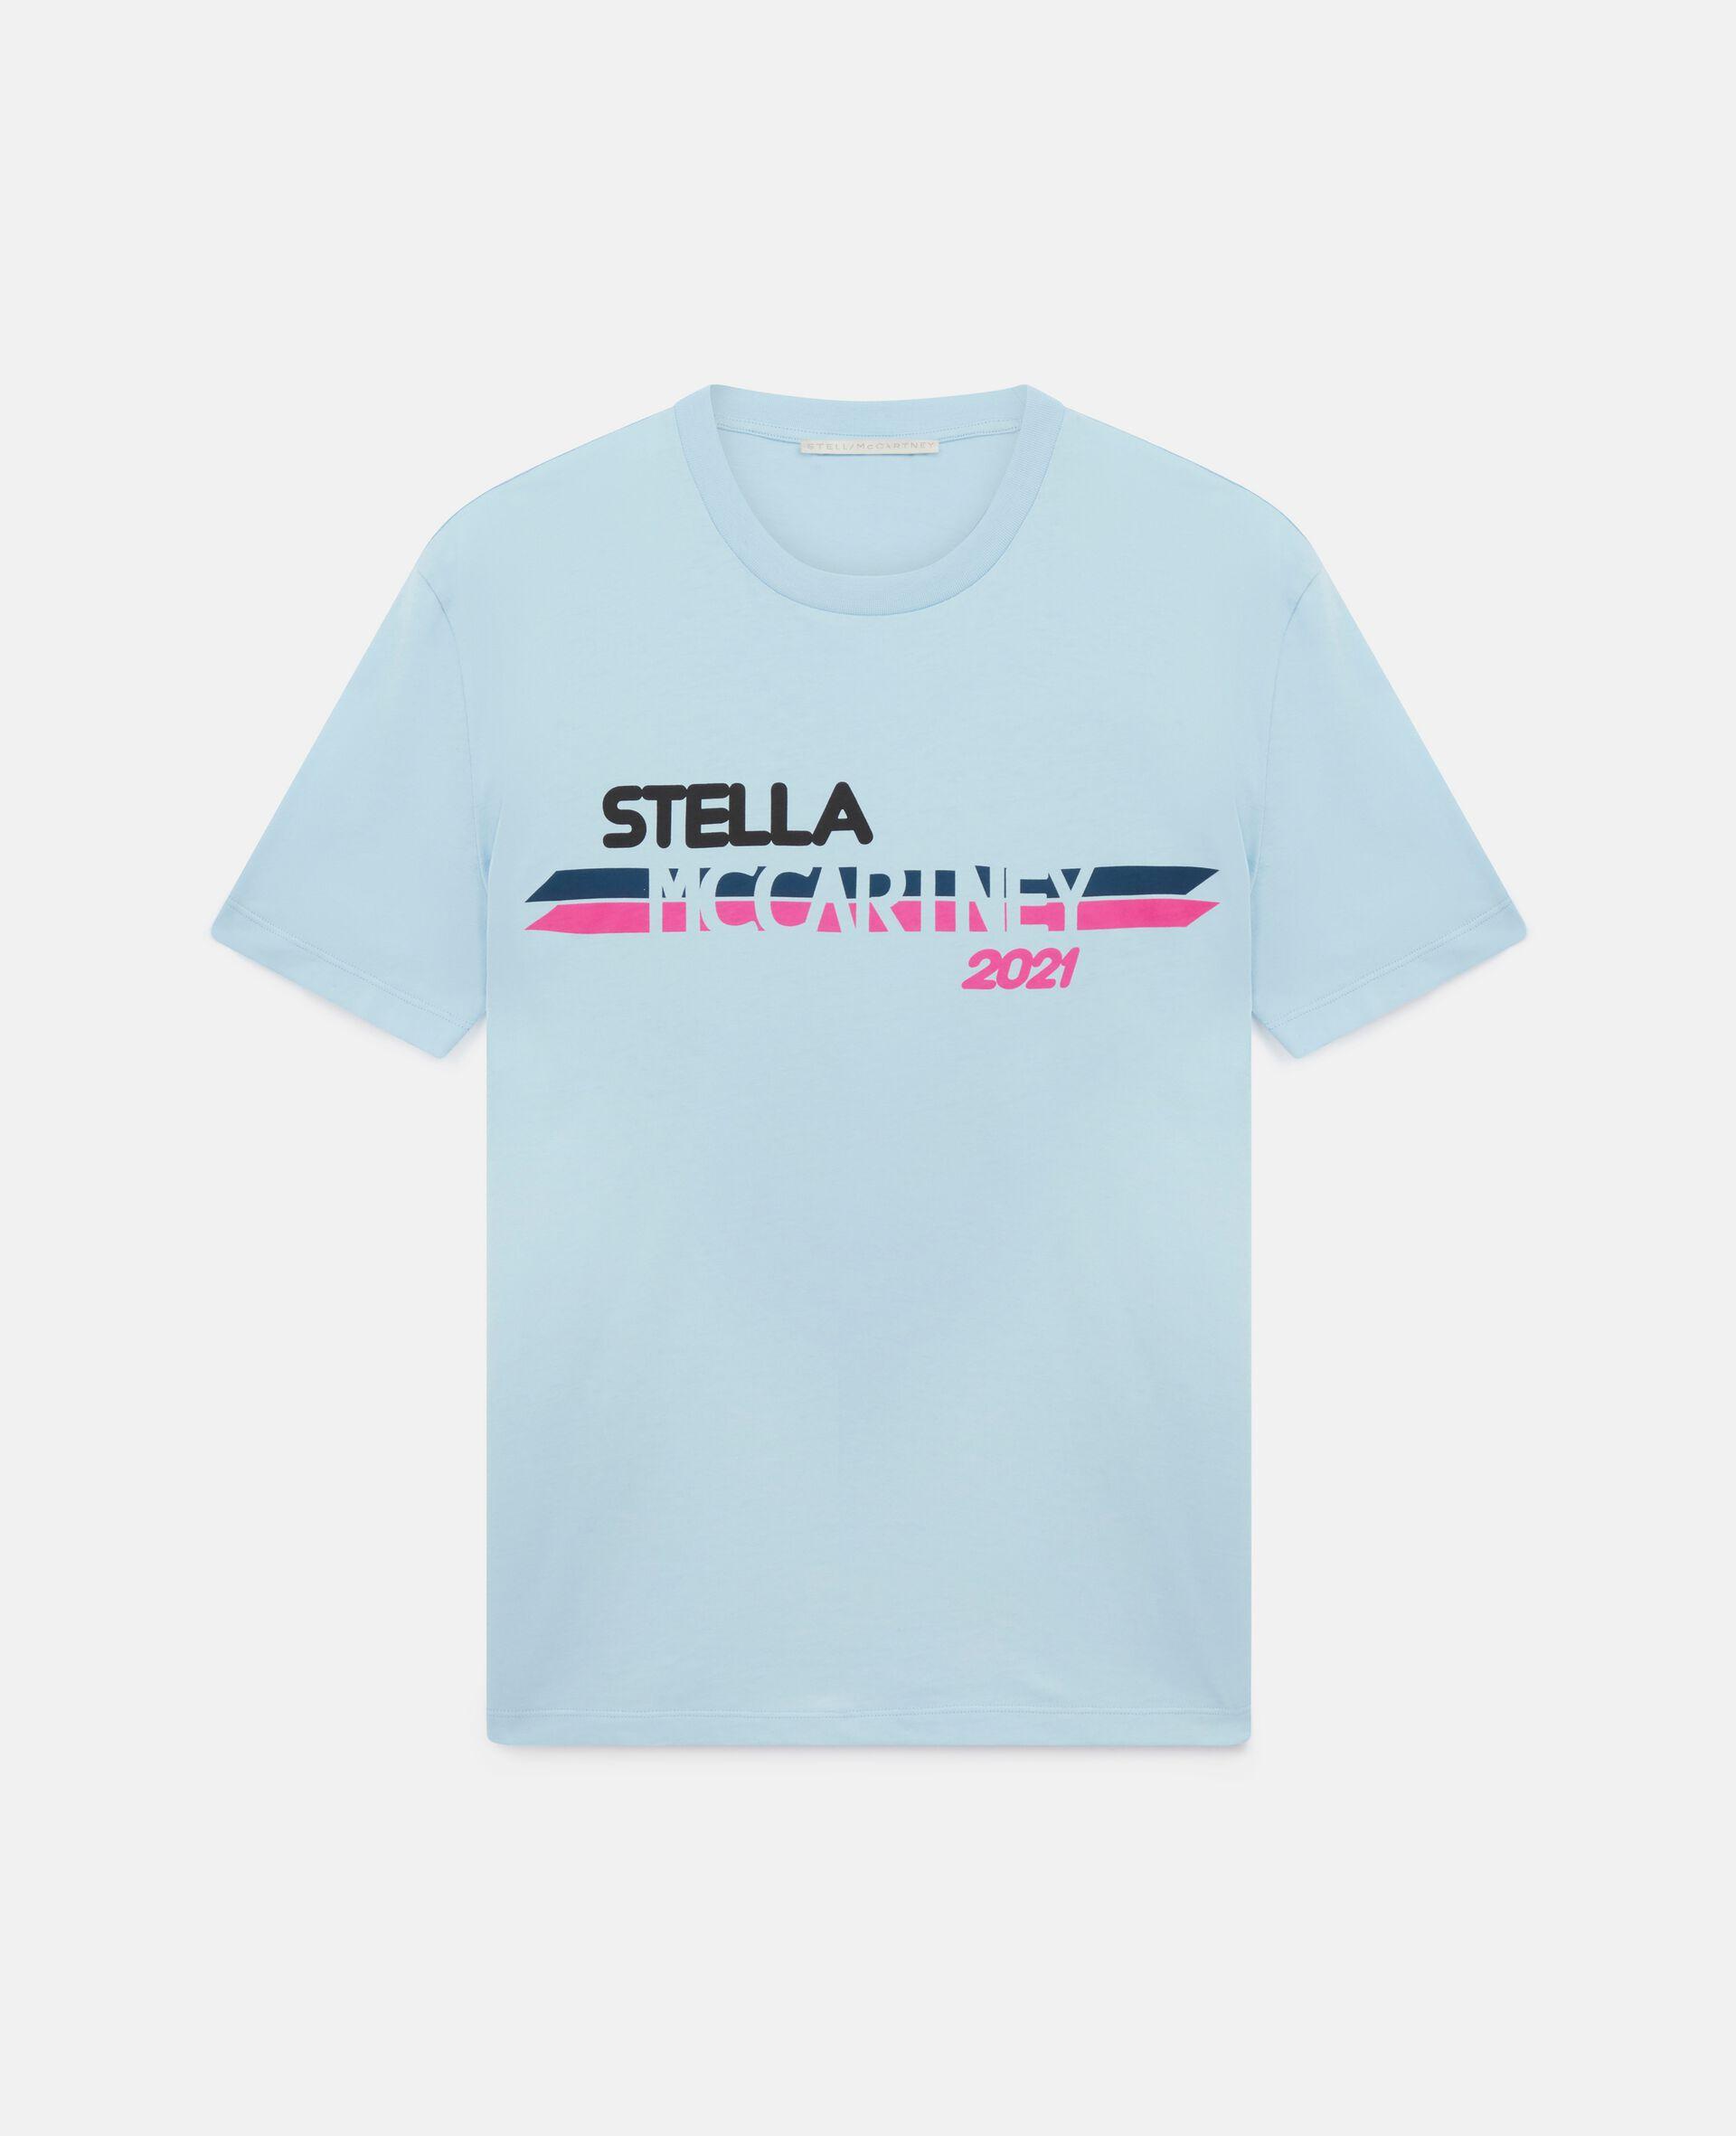 Stella McCartney 2021 Logo T-Shirt-Blue-large image number 0